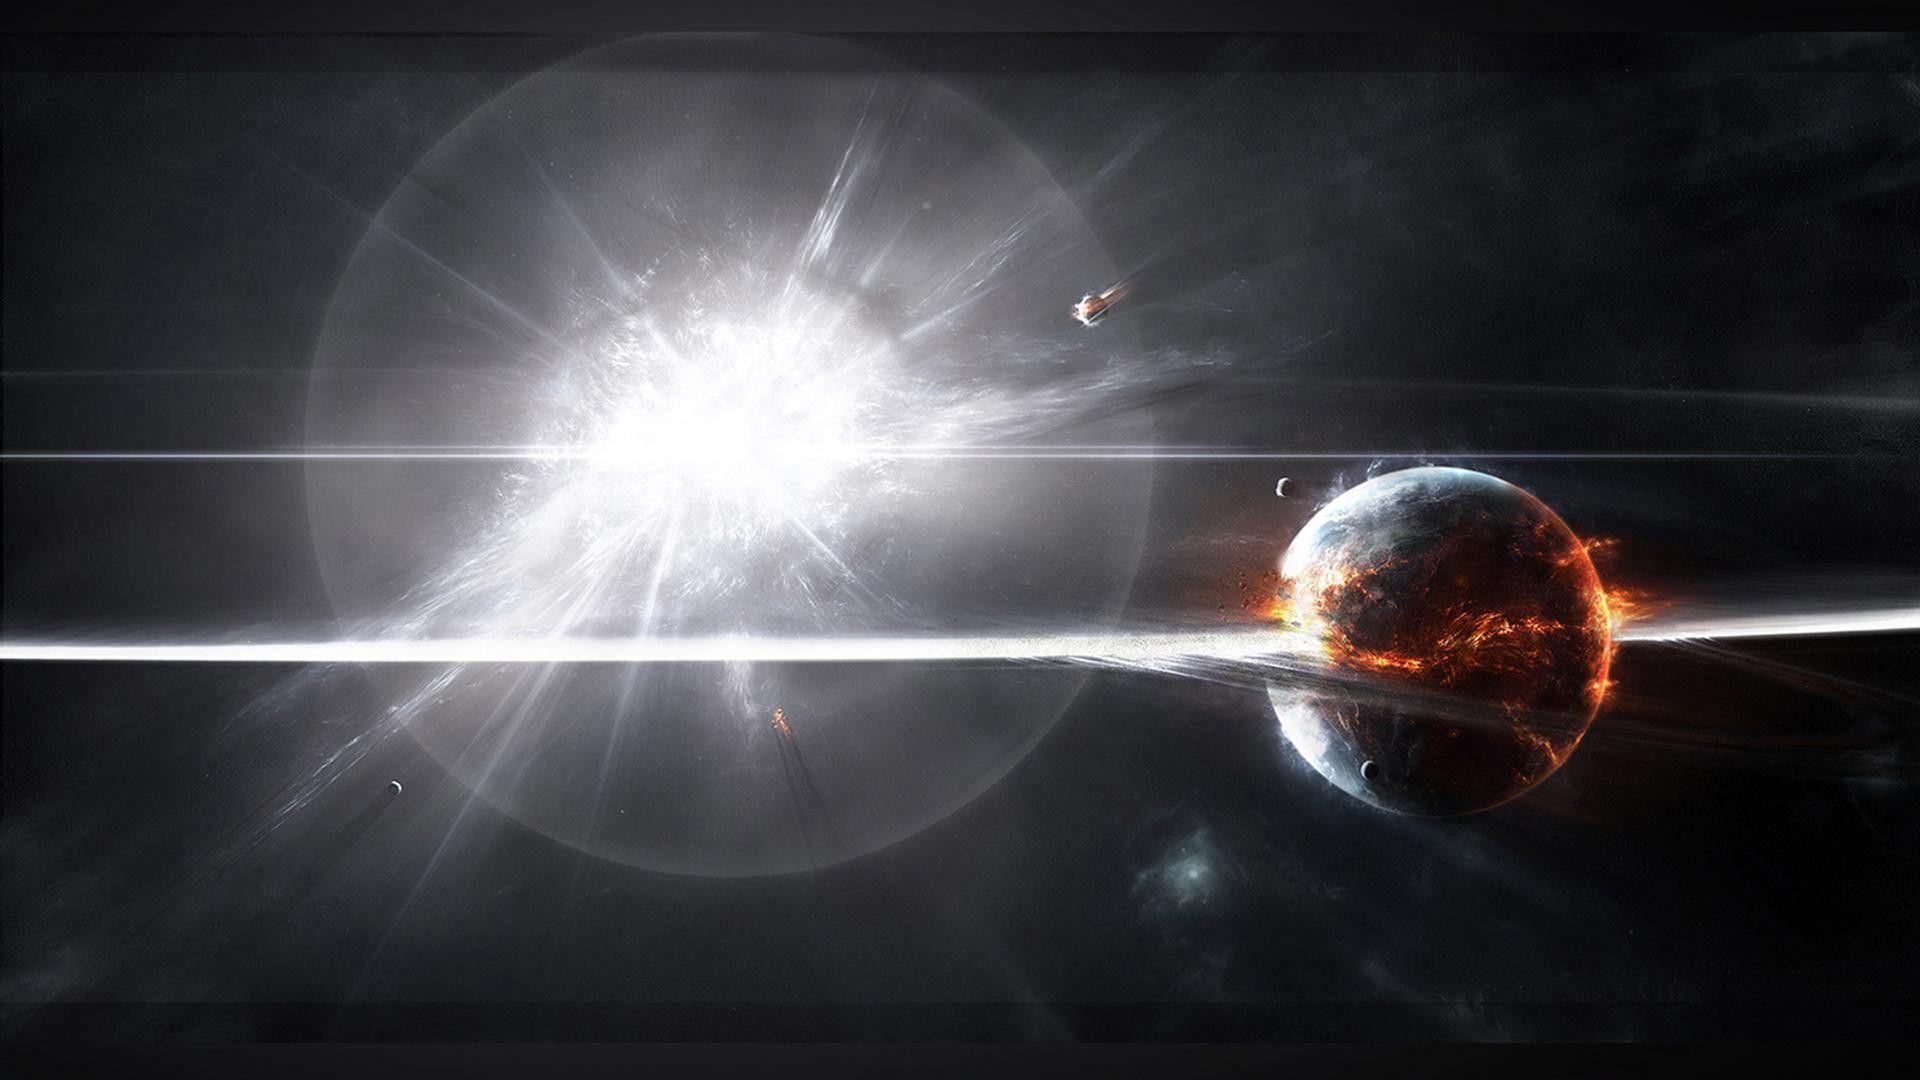 supernova desktop wallpaper - photo #22